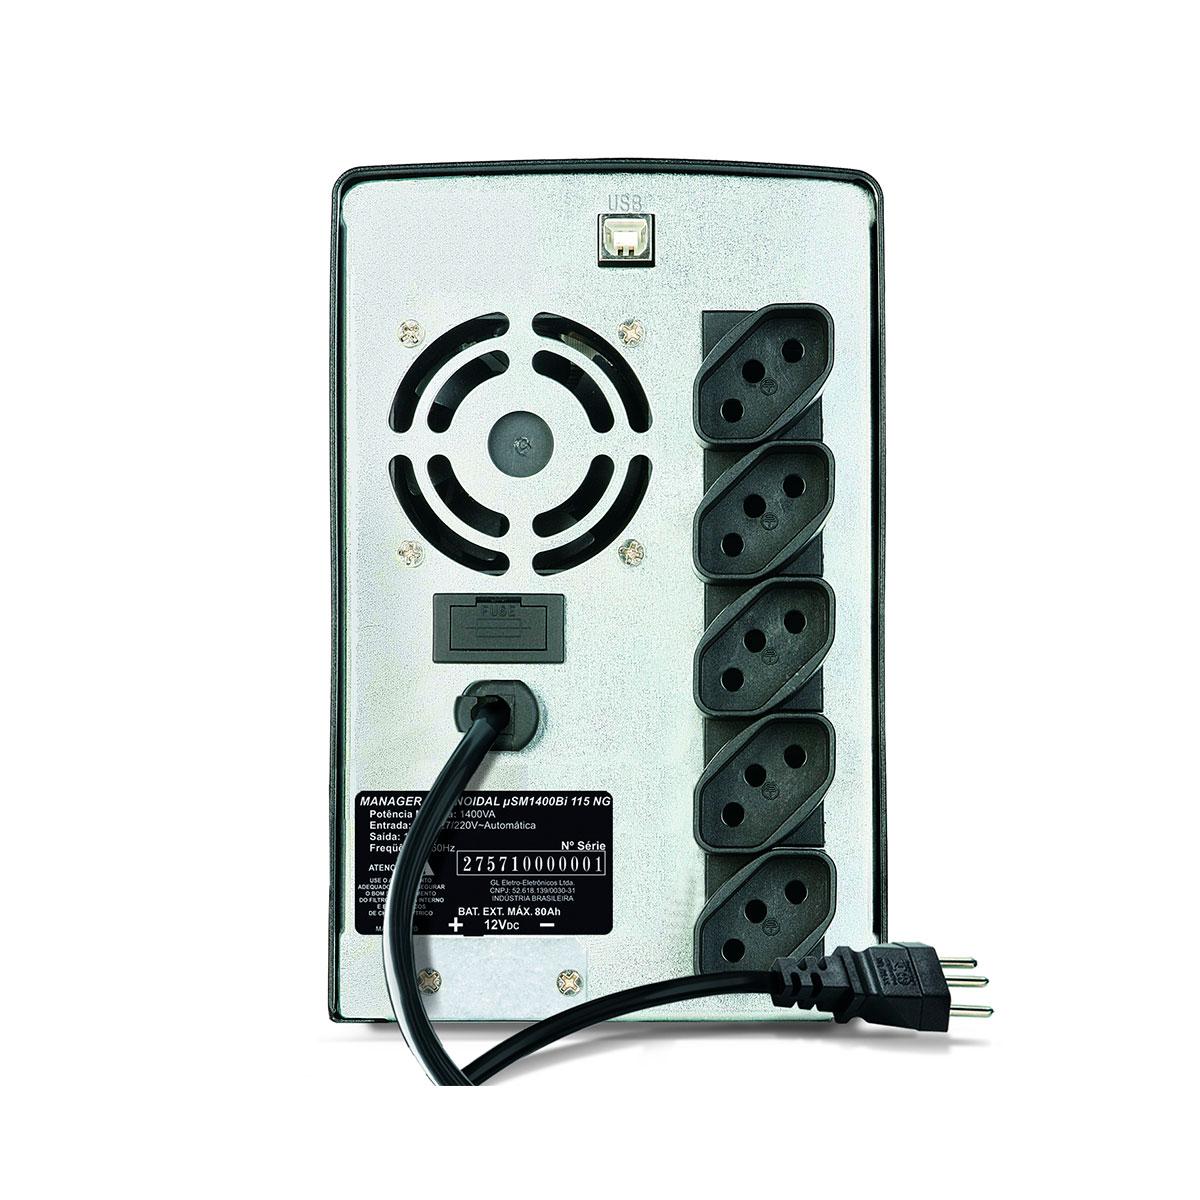 Nobreak 1500VA SMS Manager III Entrada Bivolt Saída 115V Senoidal Puro, Eng. Bateria Externa- 27572